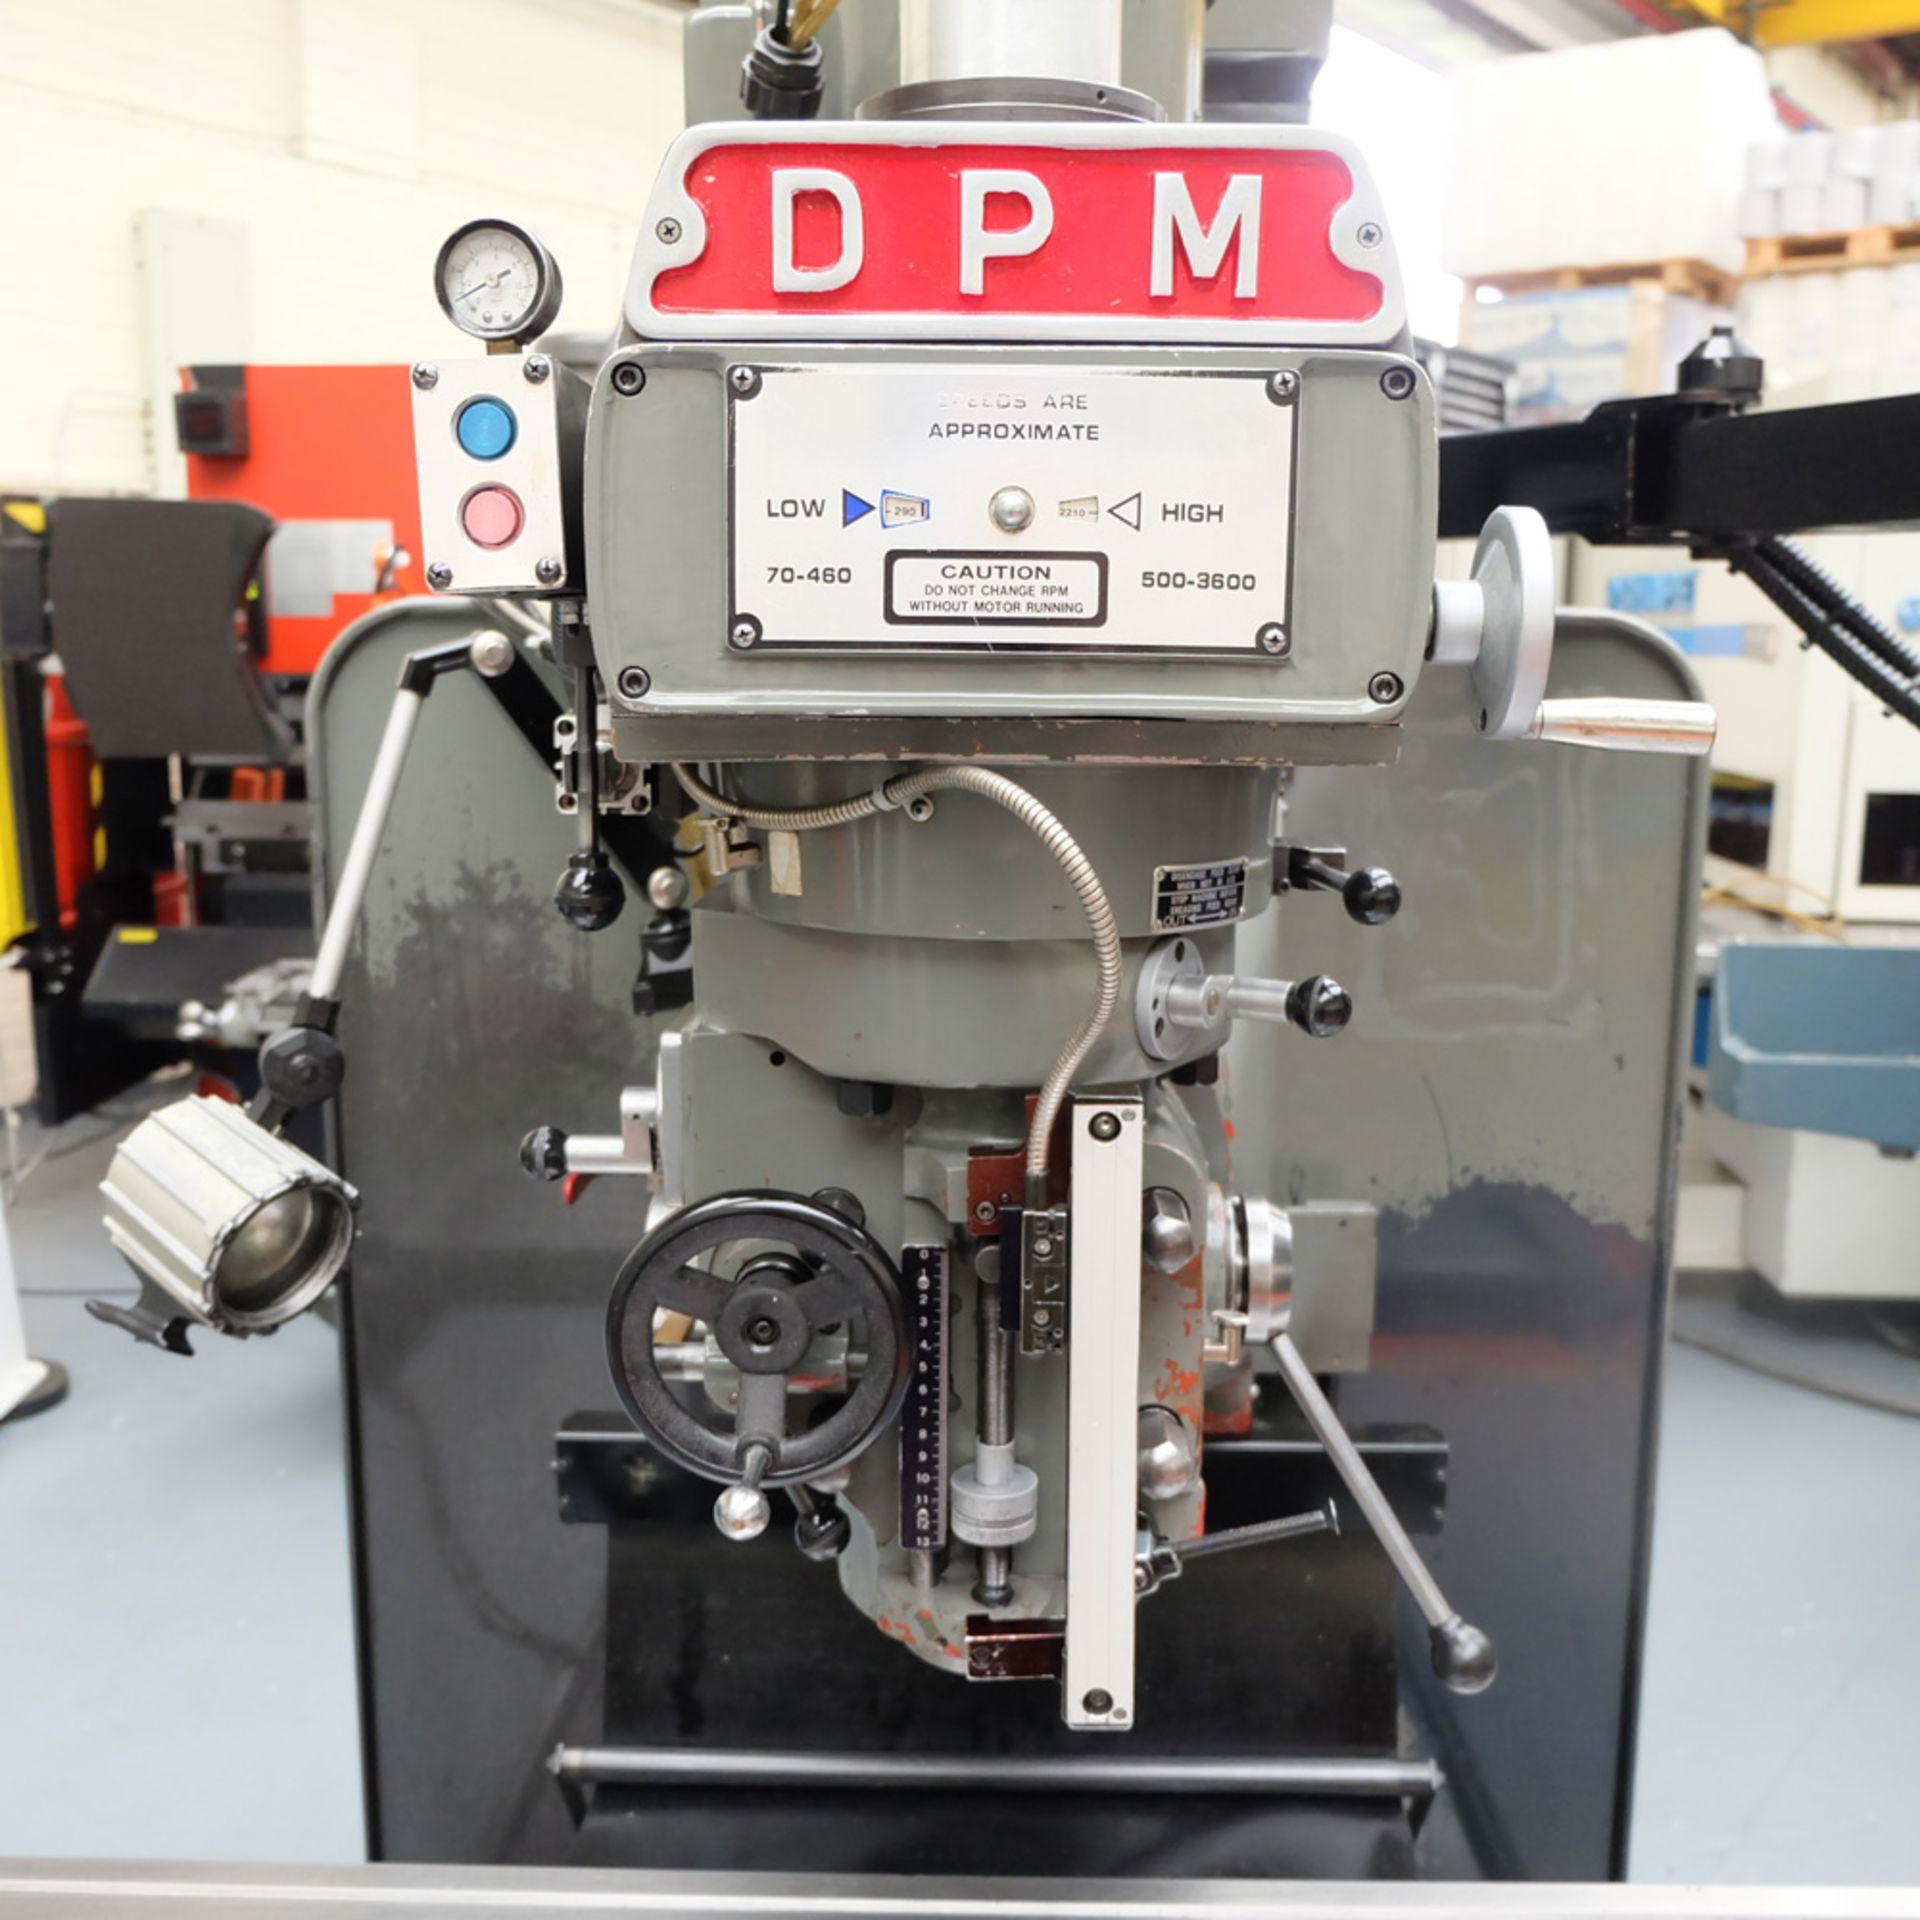 XYZ DPM Bed Mill with ProtoTRAK A.G.E. 3 Control. Prototrak A.G.E. - Image 4 of 10